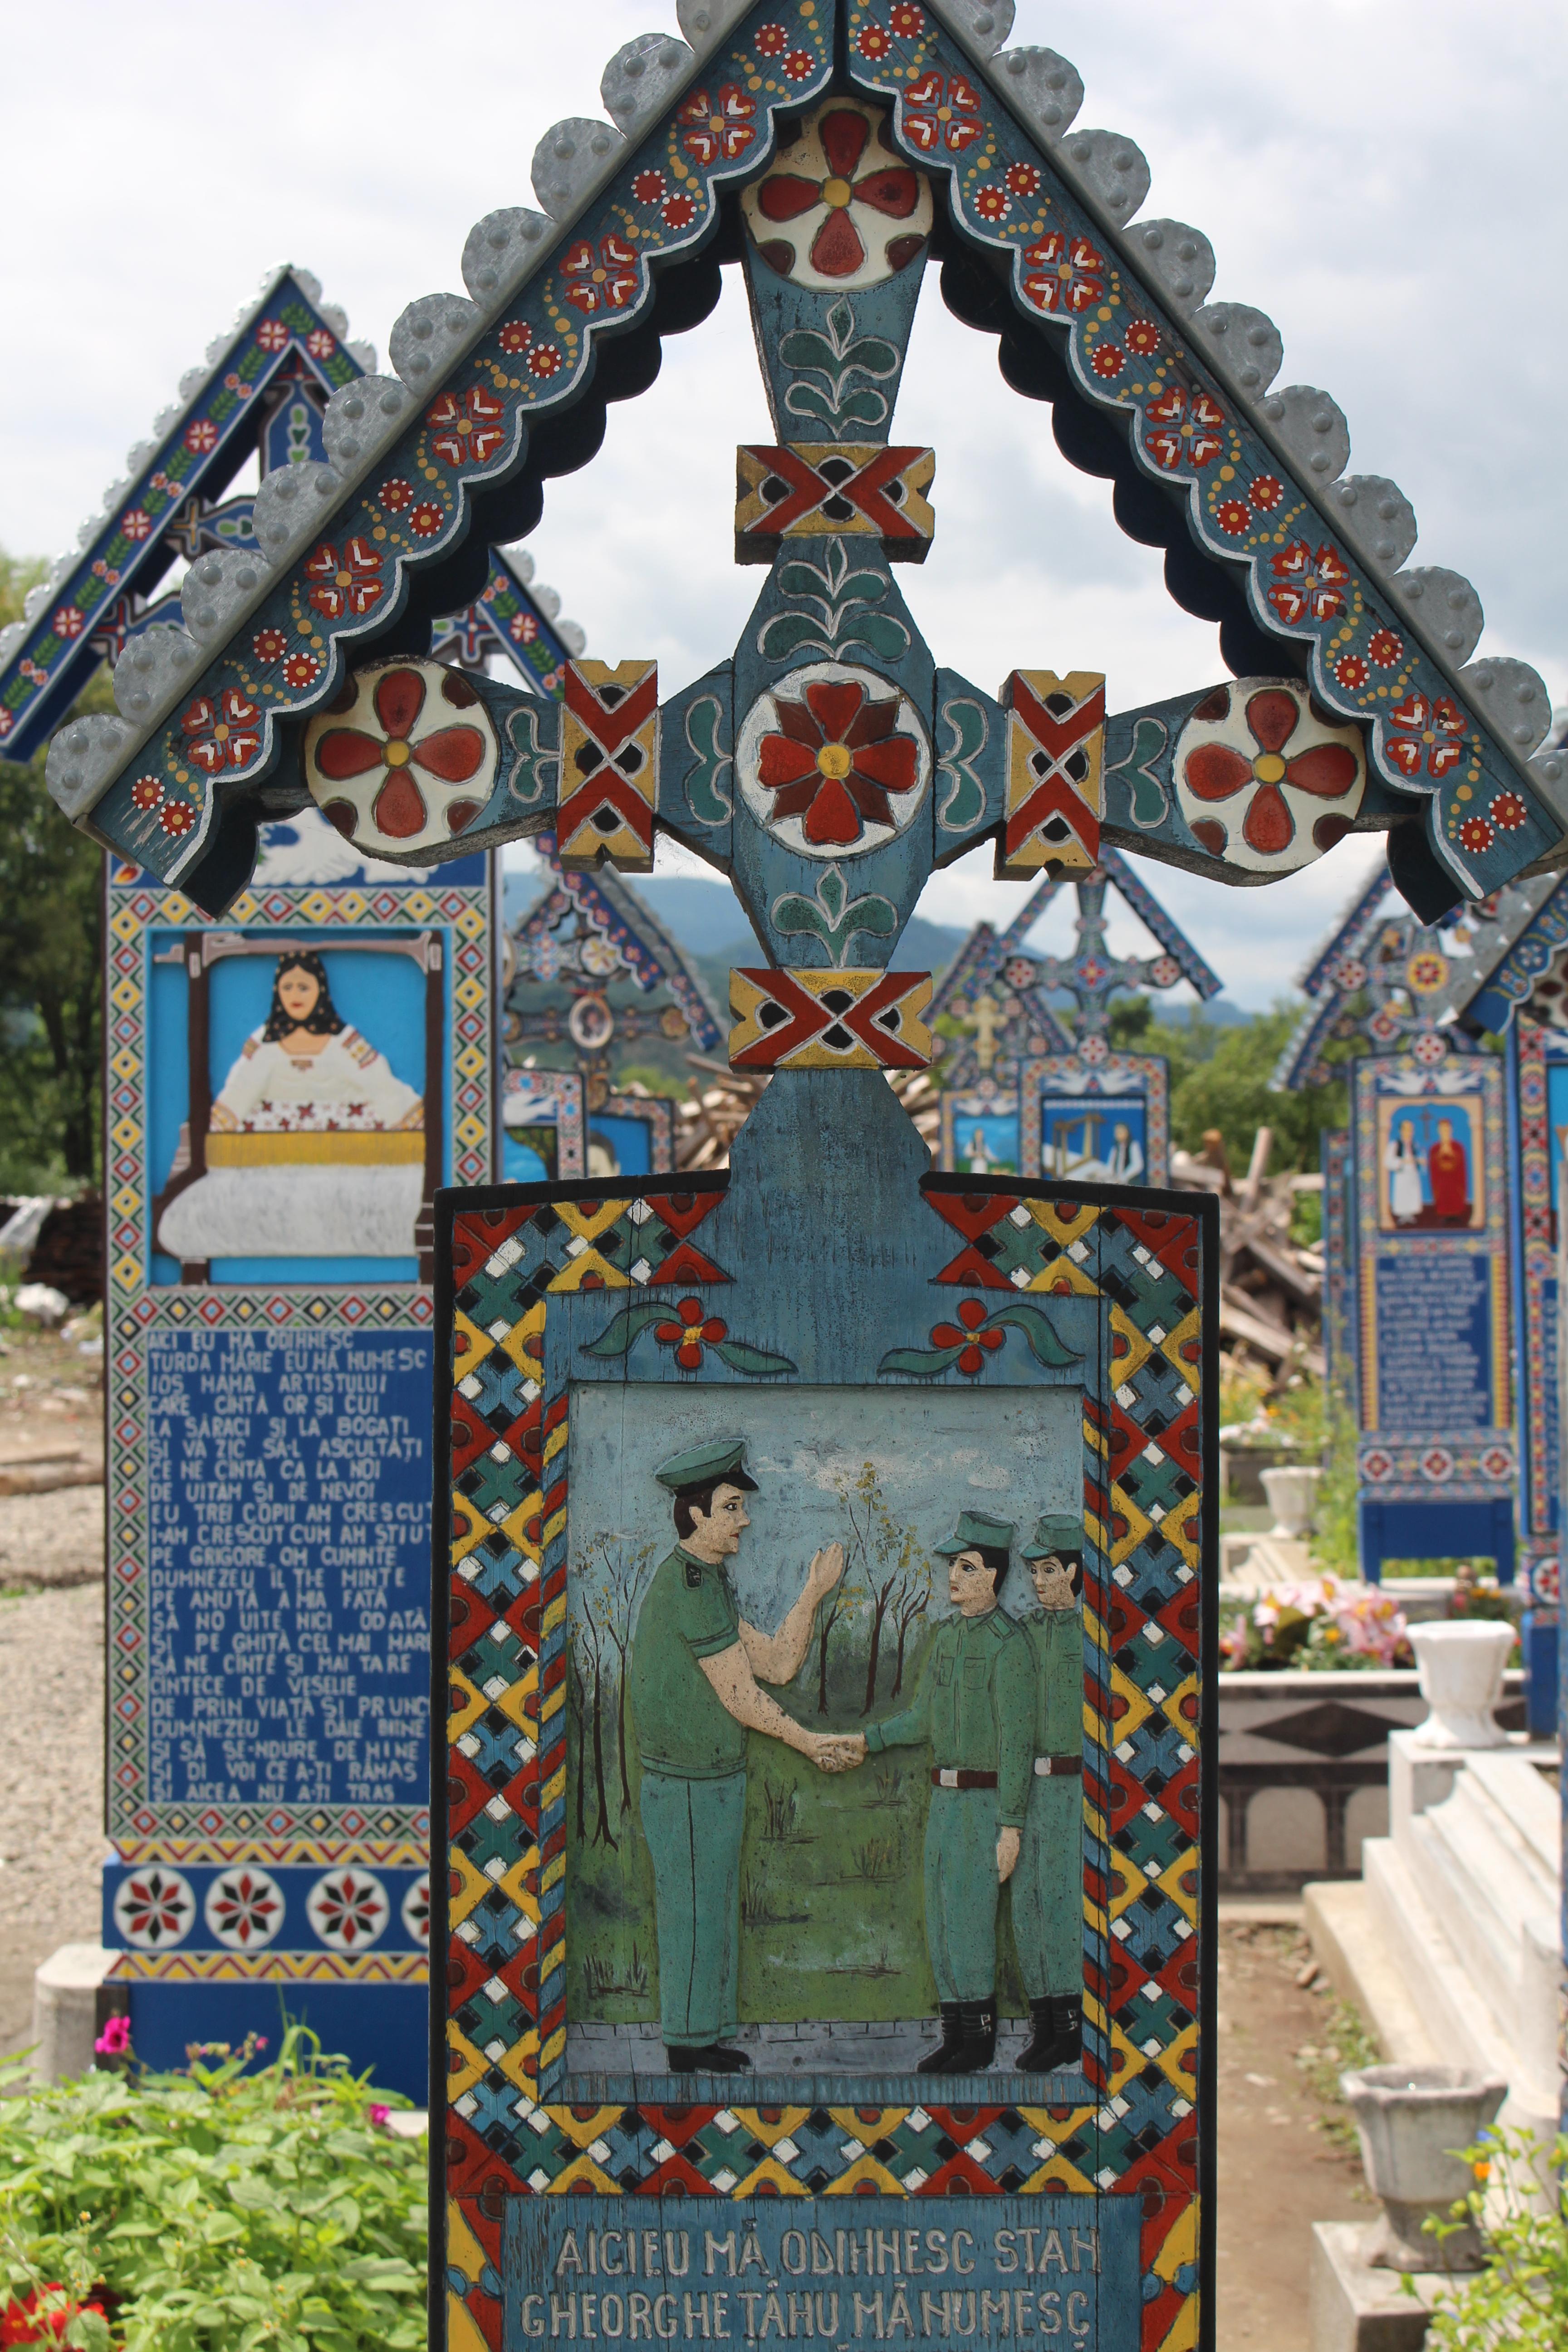 Le cimetière joyeux de Săpântă